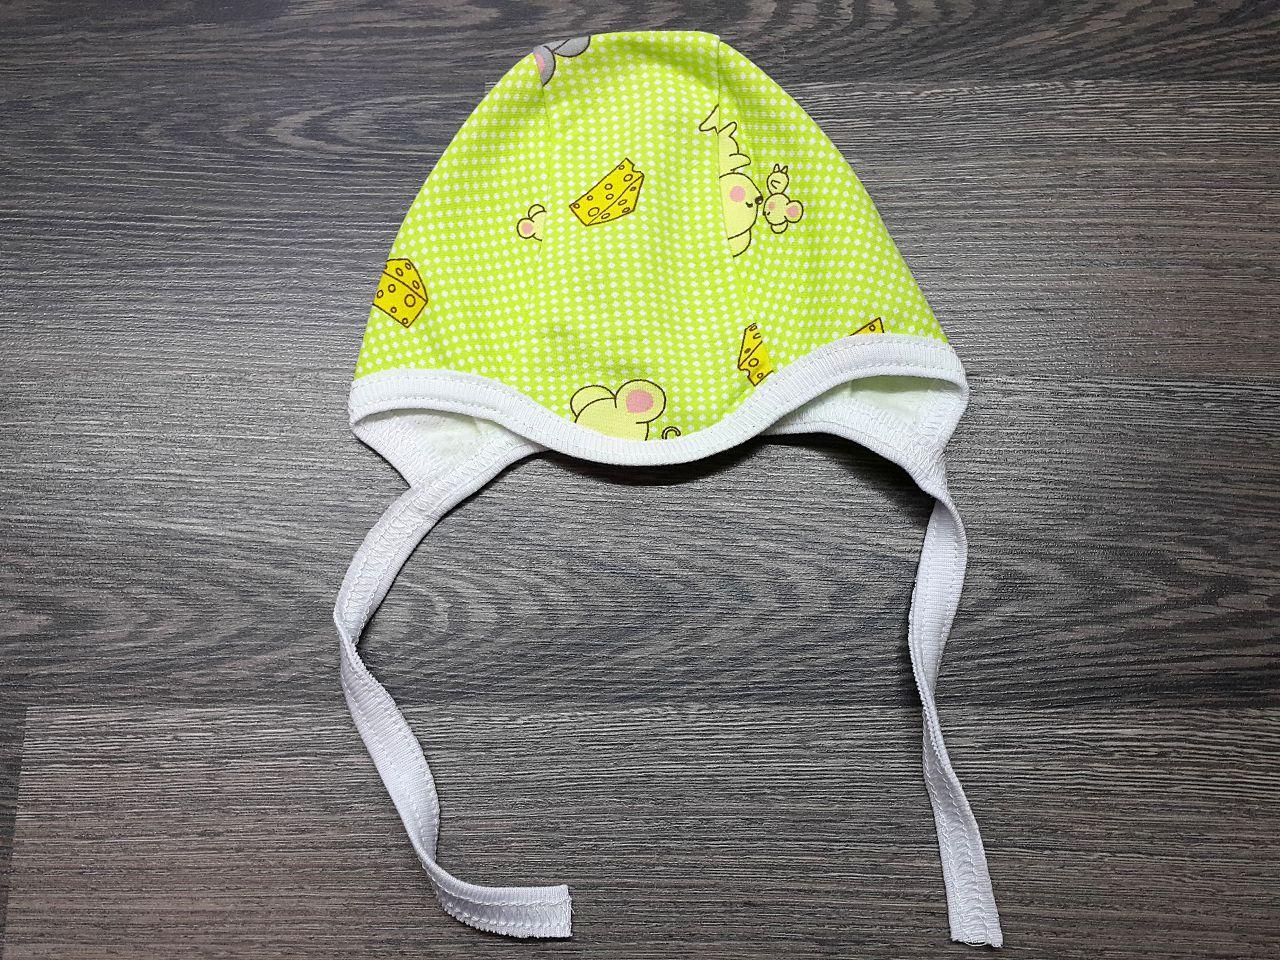 Чепчик тёплый для малыша зелёный с мышками